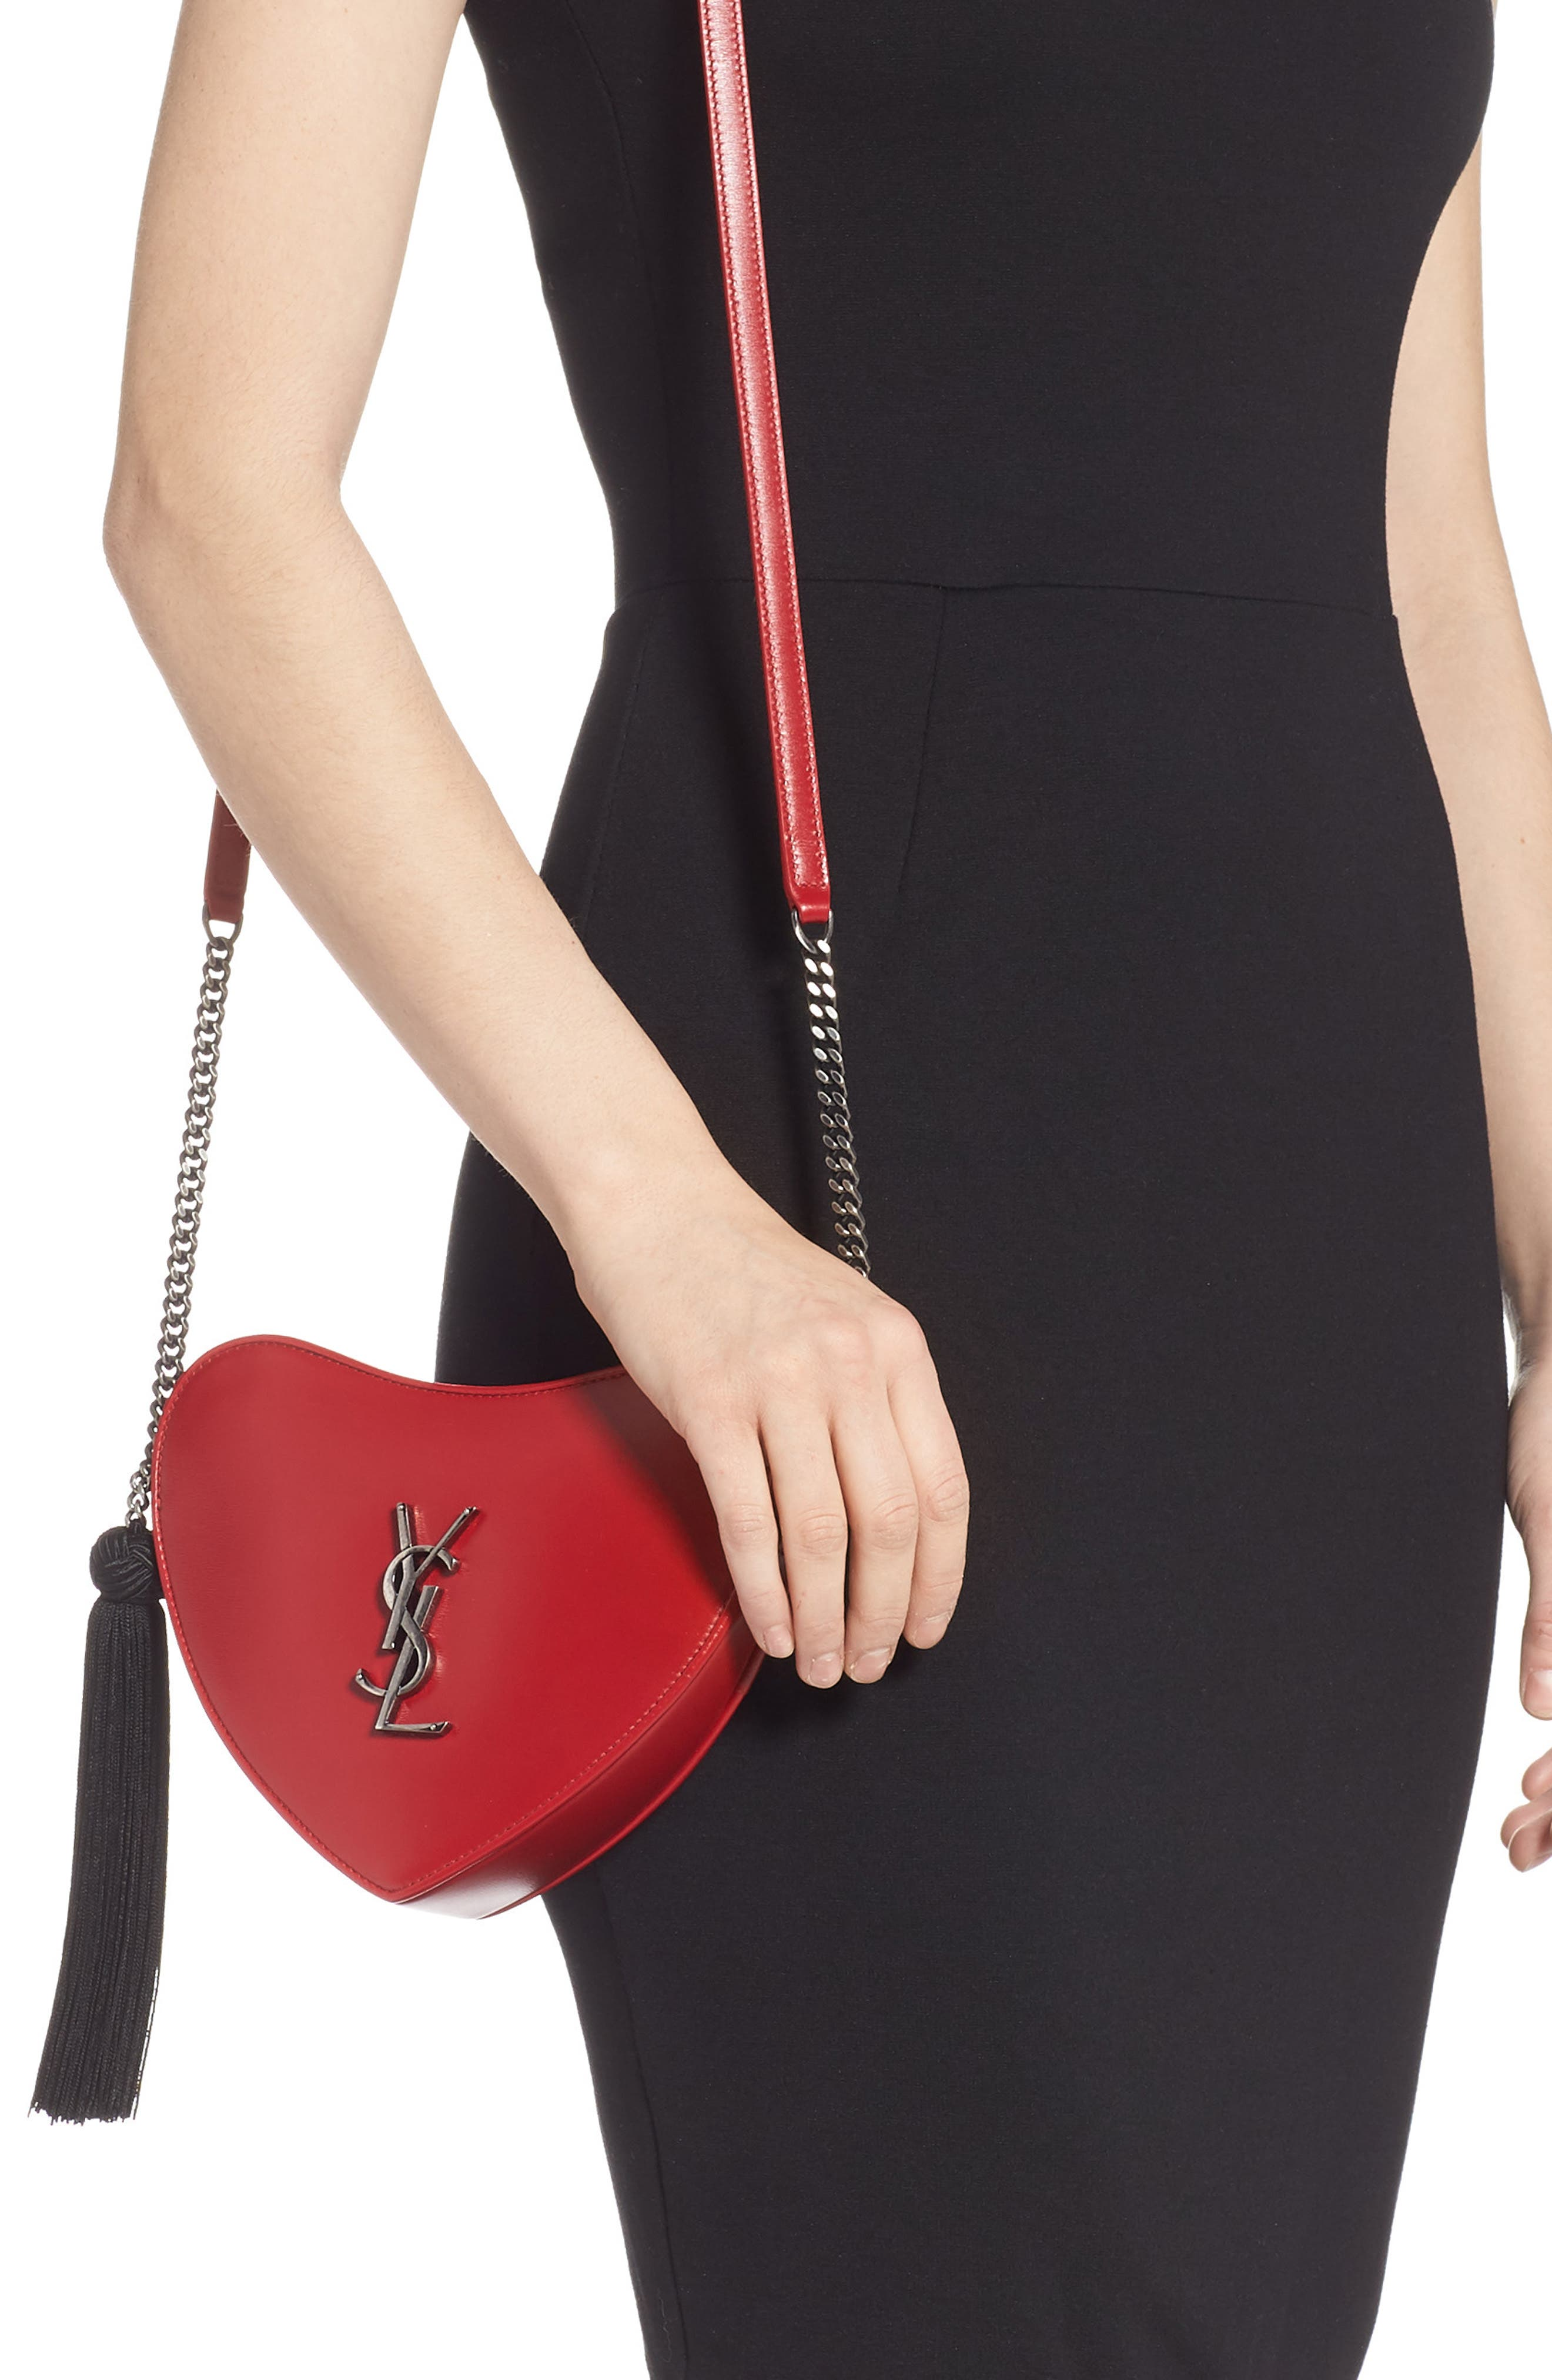 Sac Coeur Leather Crossbody Bag,                             Alternate thumbnail 2, color,                             BANDANA RED/ NOIR